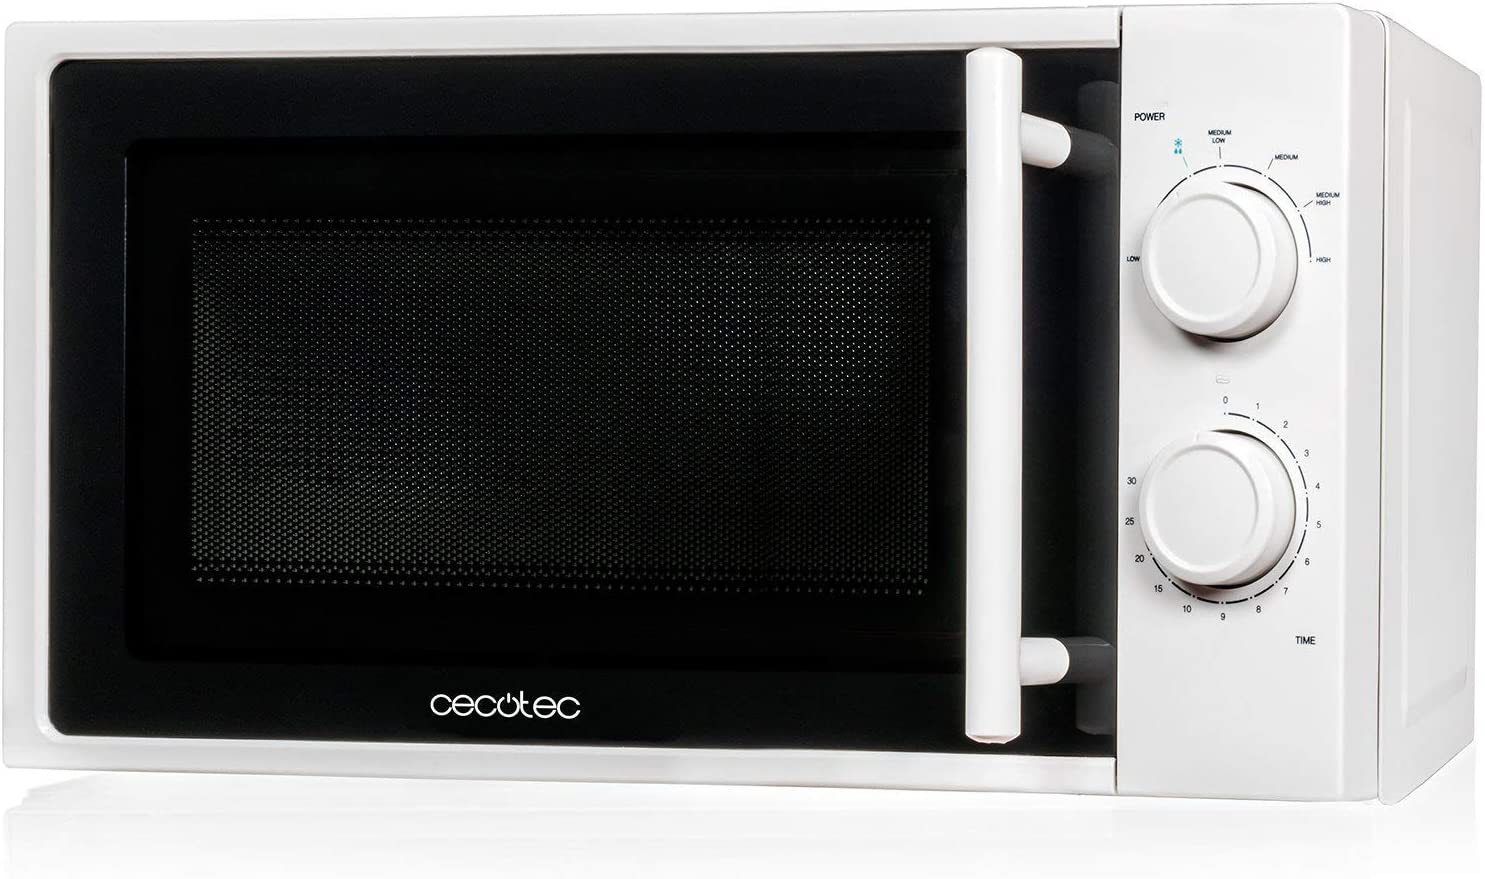 Cecotec Microondas Sencillo White Capacidad de 20L, 700 W, temporizador hasta 30 min, 6 niveles de potencia